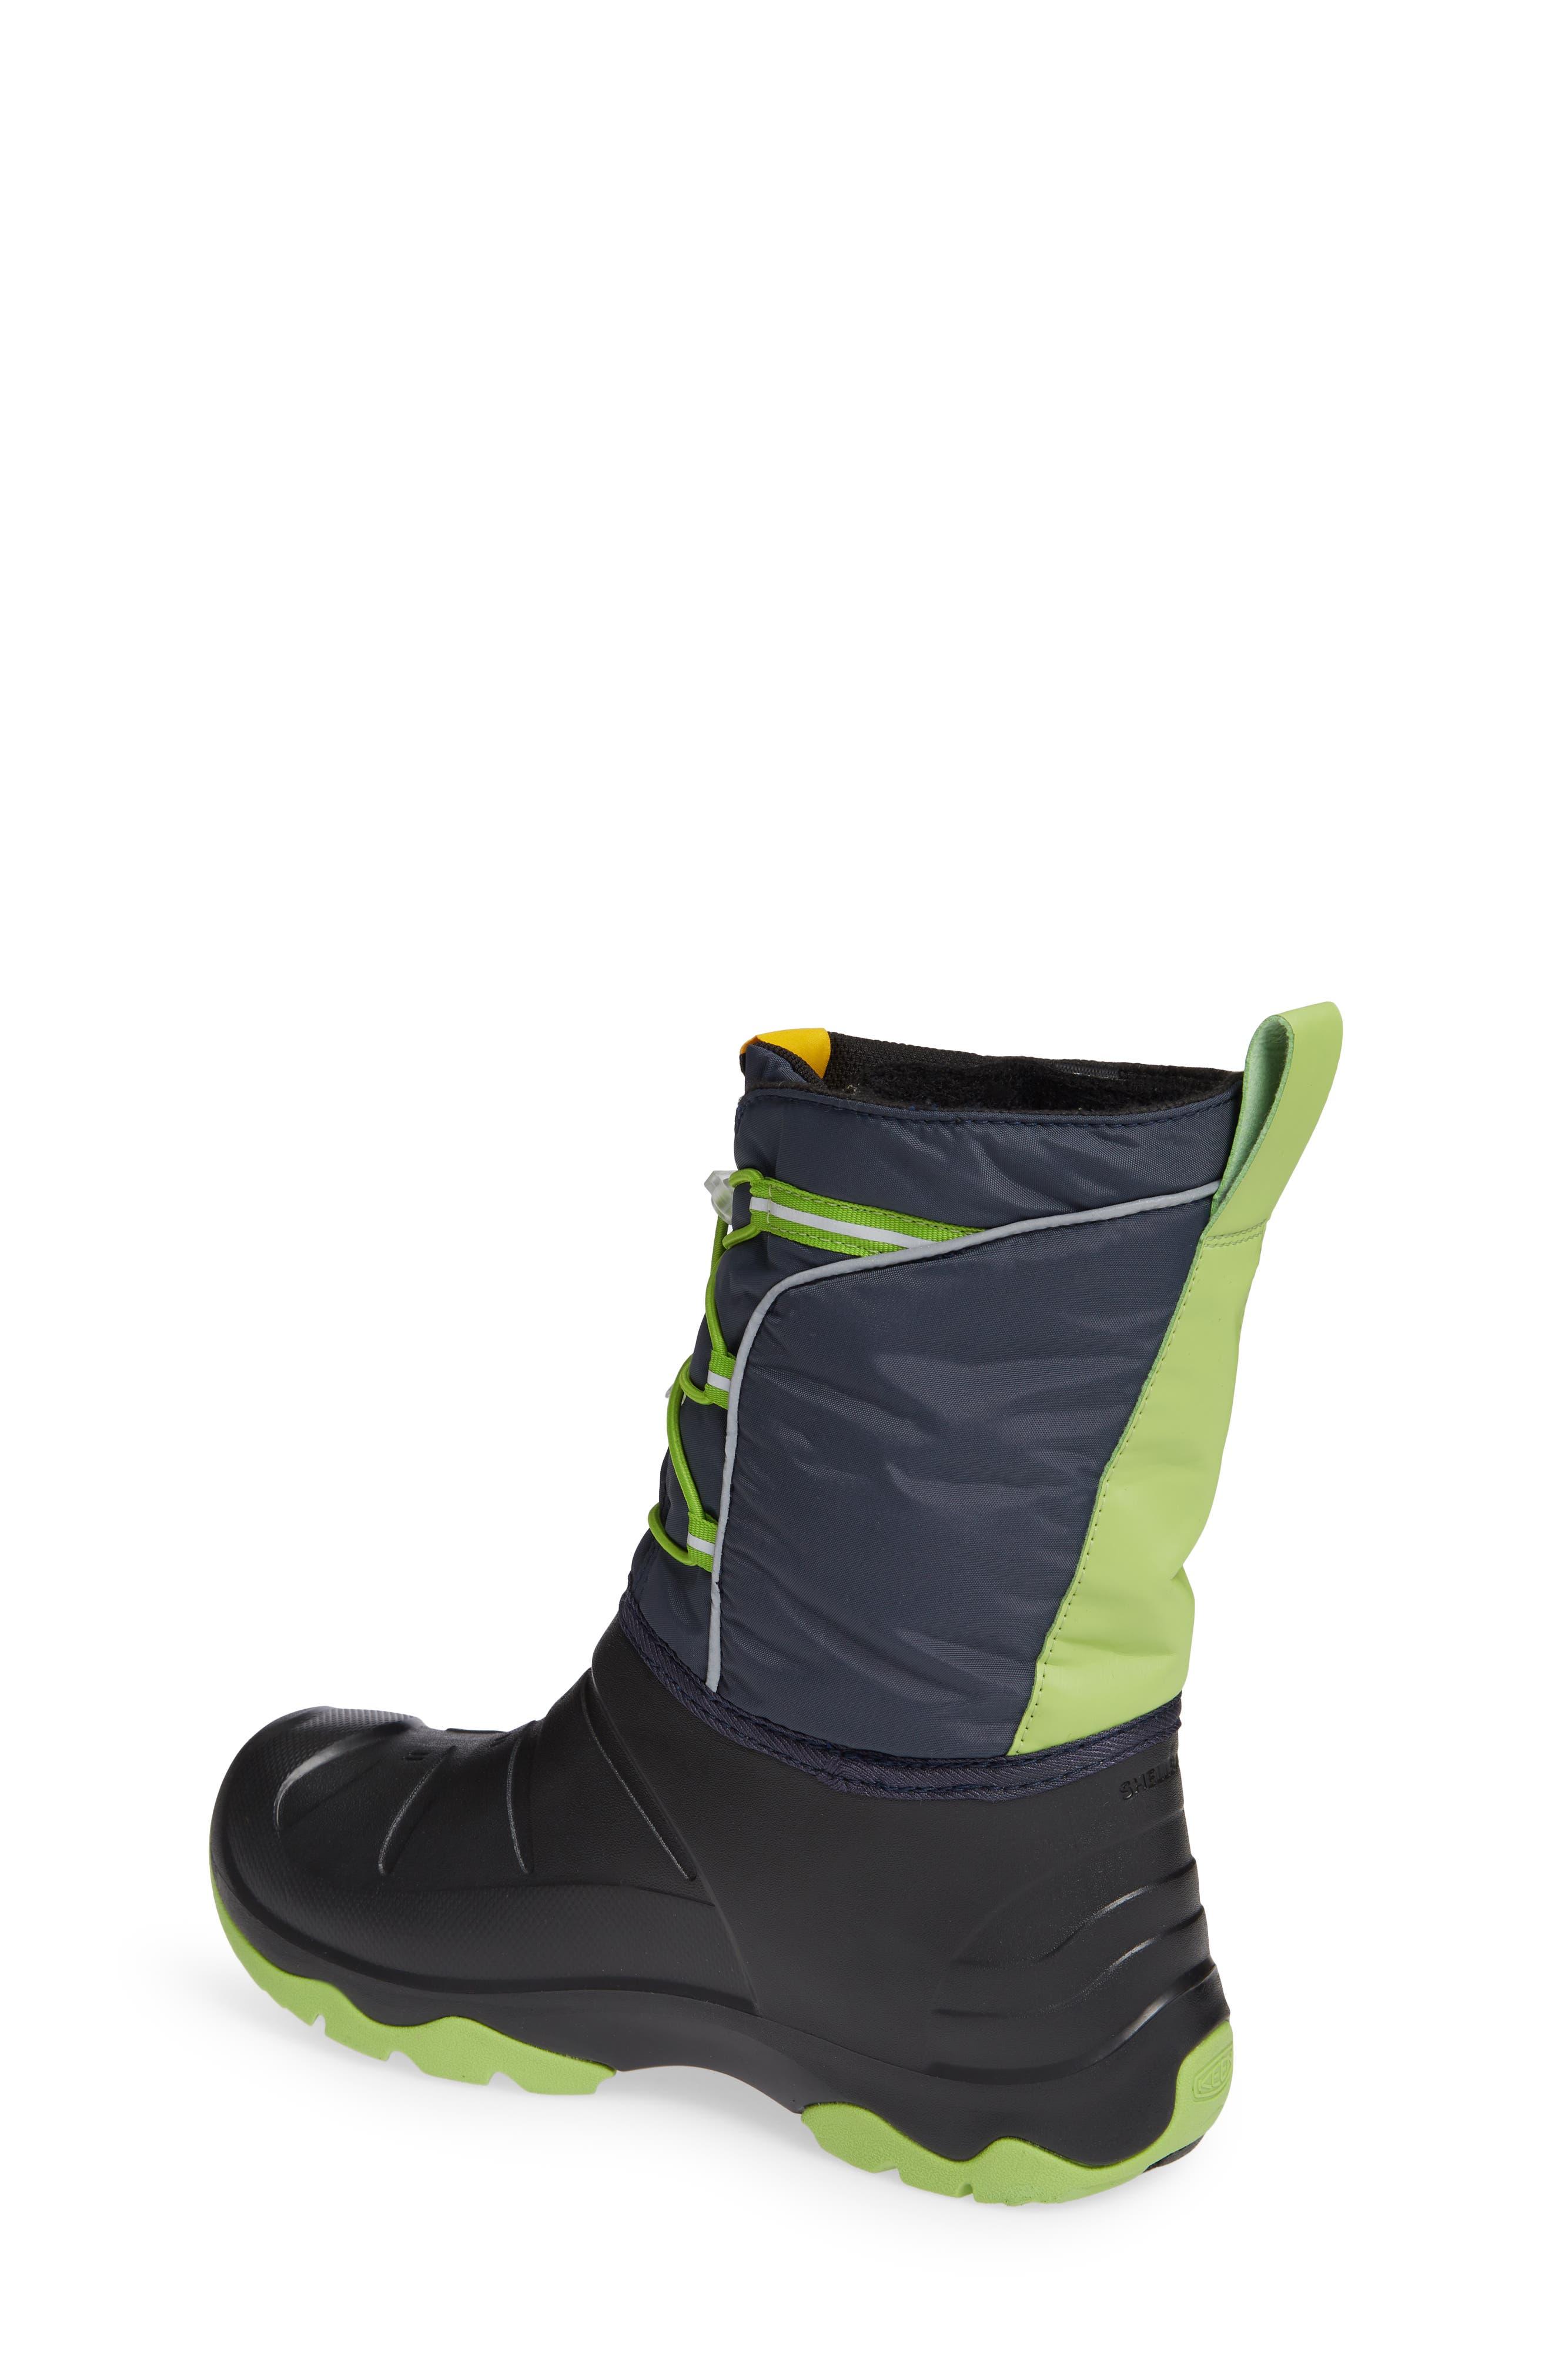 KEEN, Lumi Waterproof Boot, Alternate thumbnail 2, color, BLUE/ GREENERY